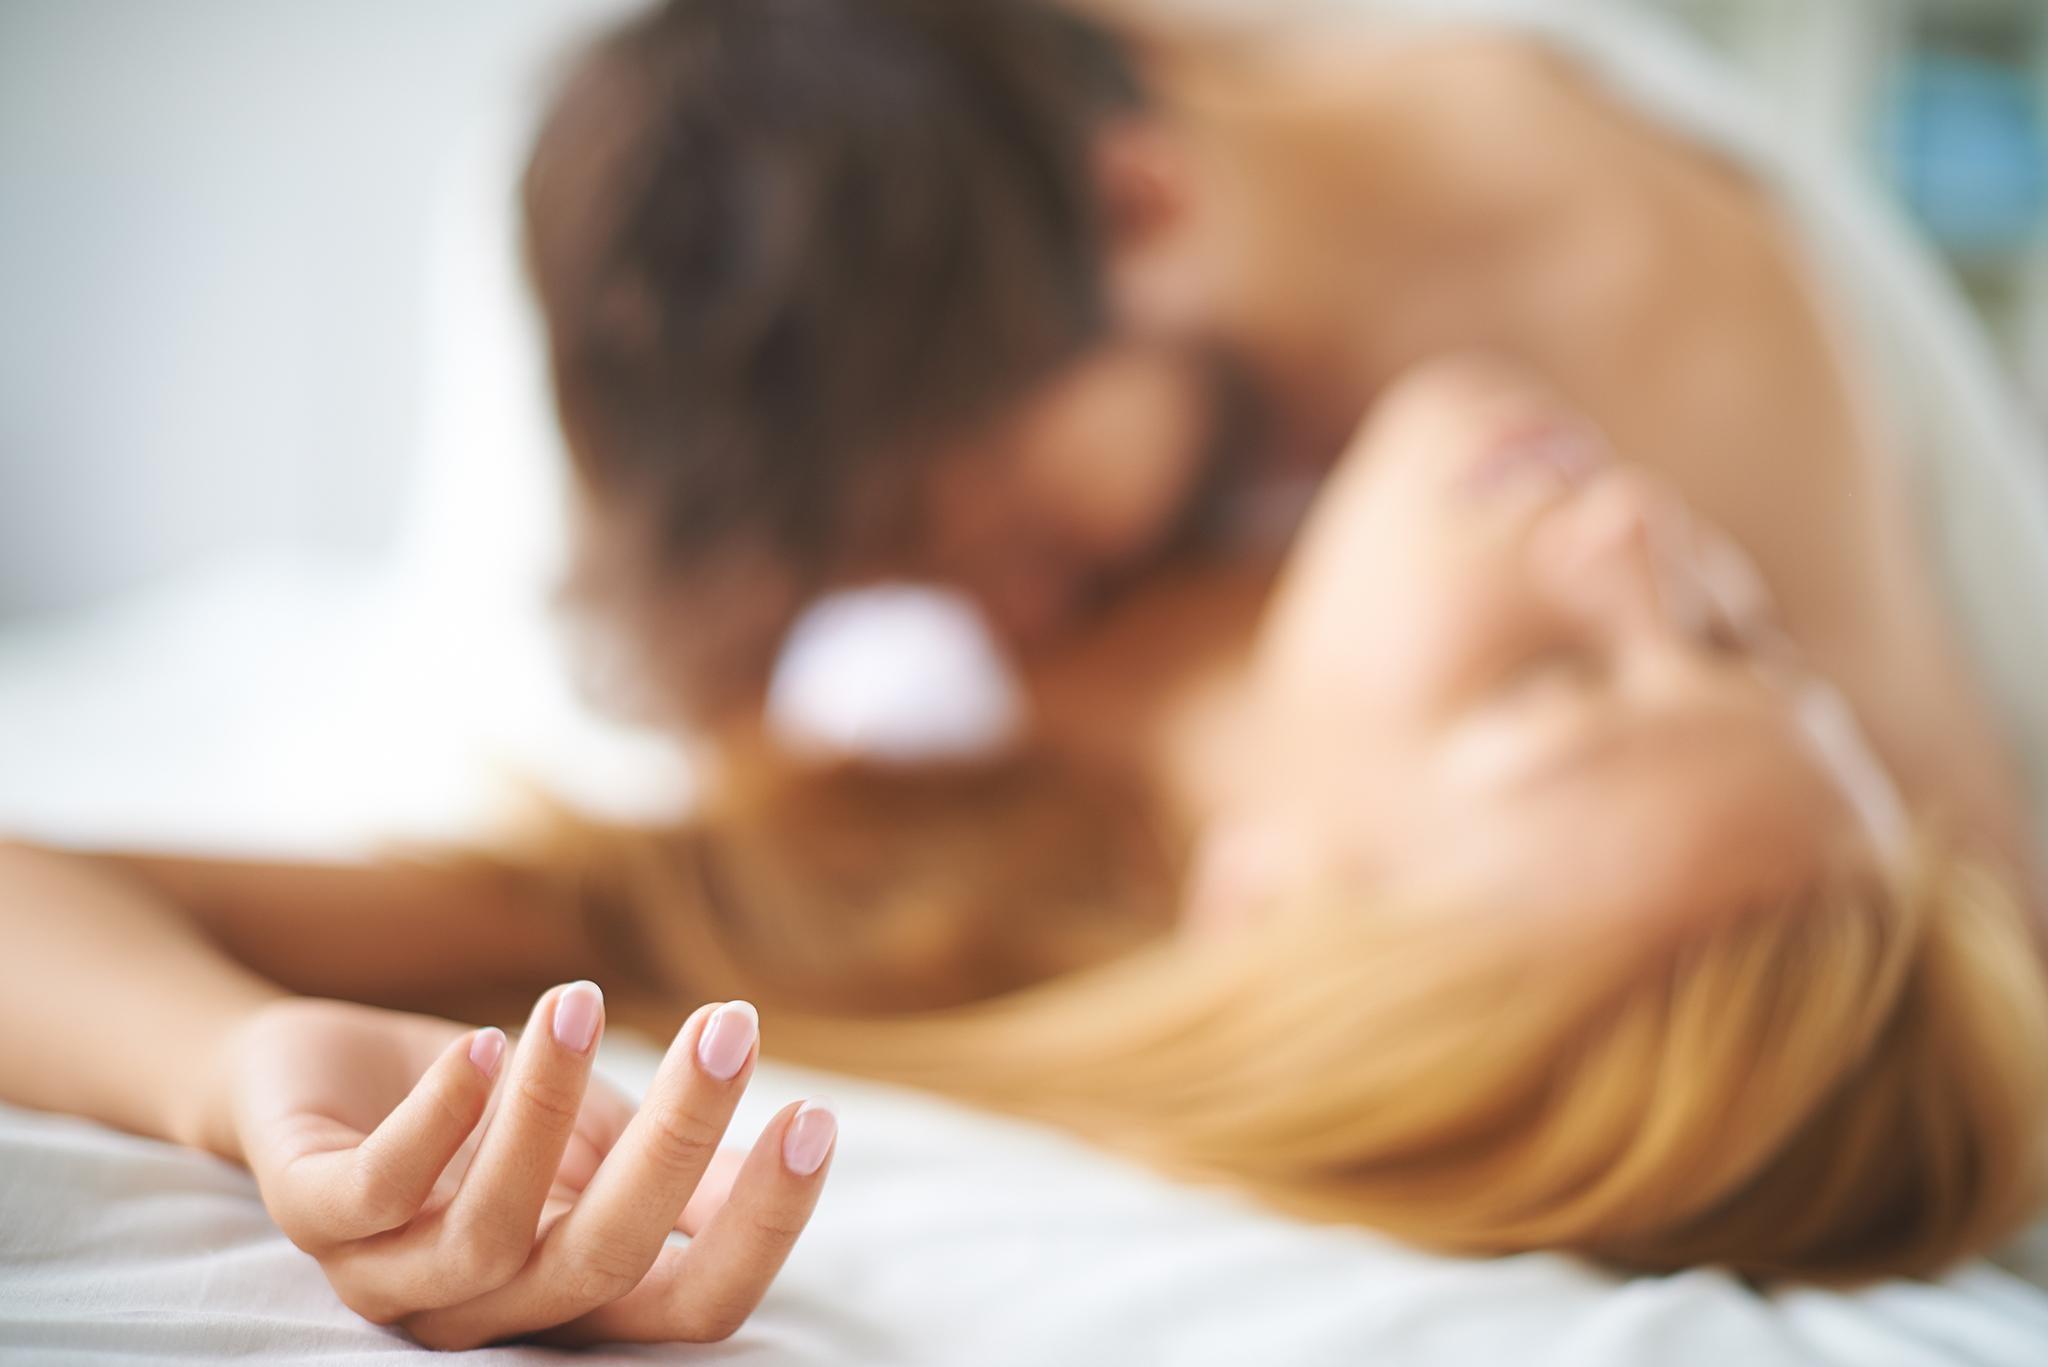 love spells,authentic lust spells,benefits of sex and lust spells,sex spells,lust spells